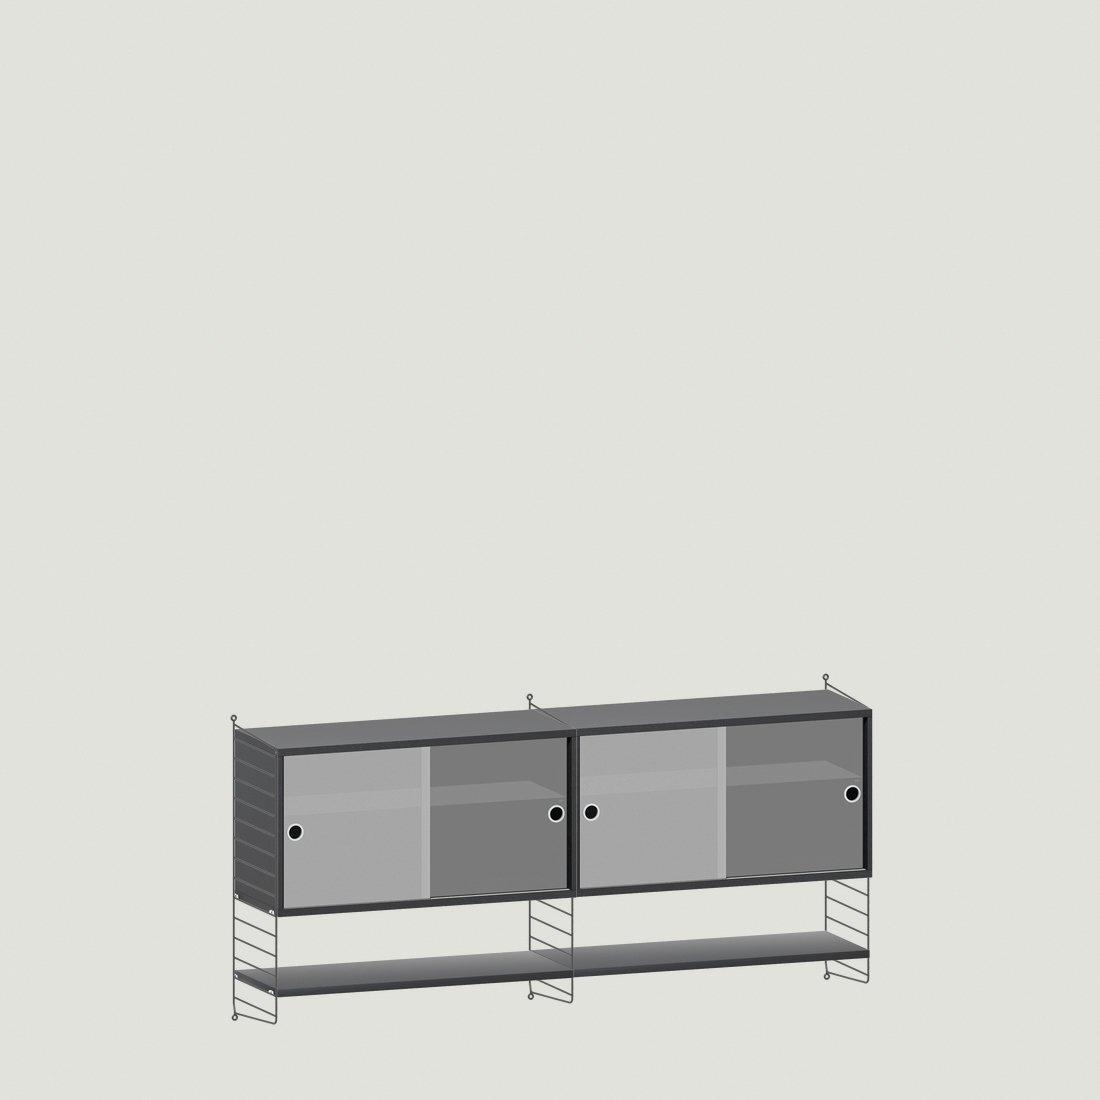 String Furniture Wandkast Dubbel Zwart